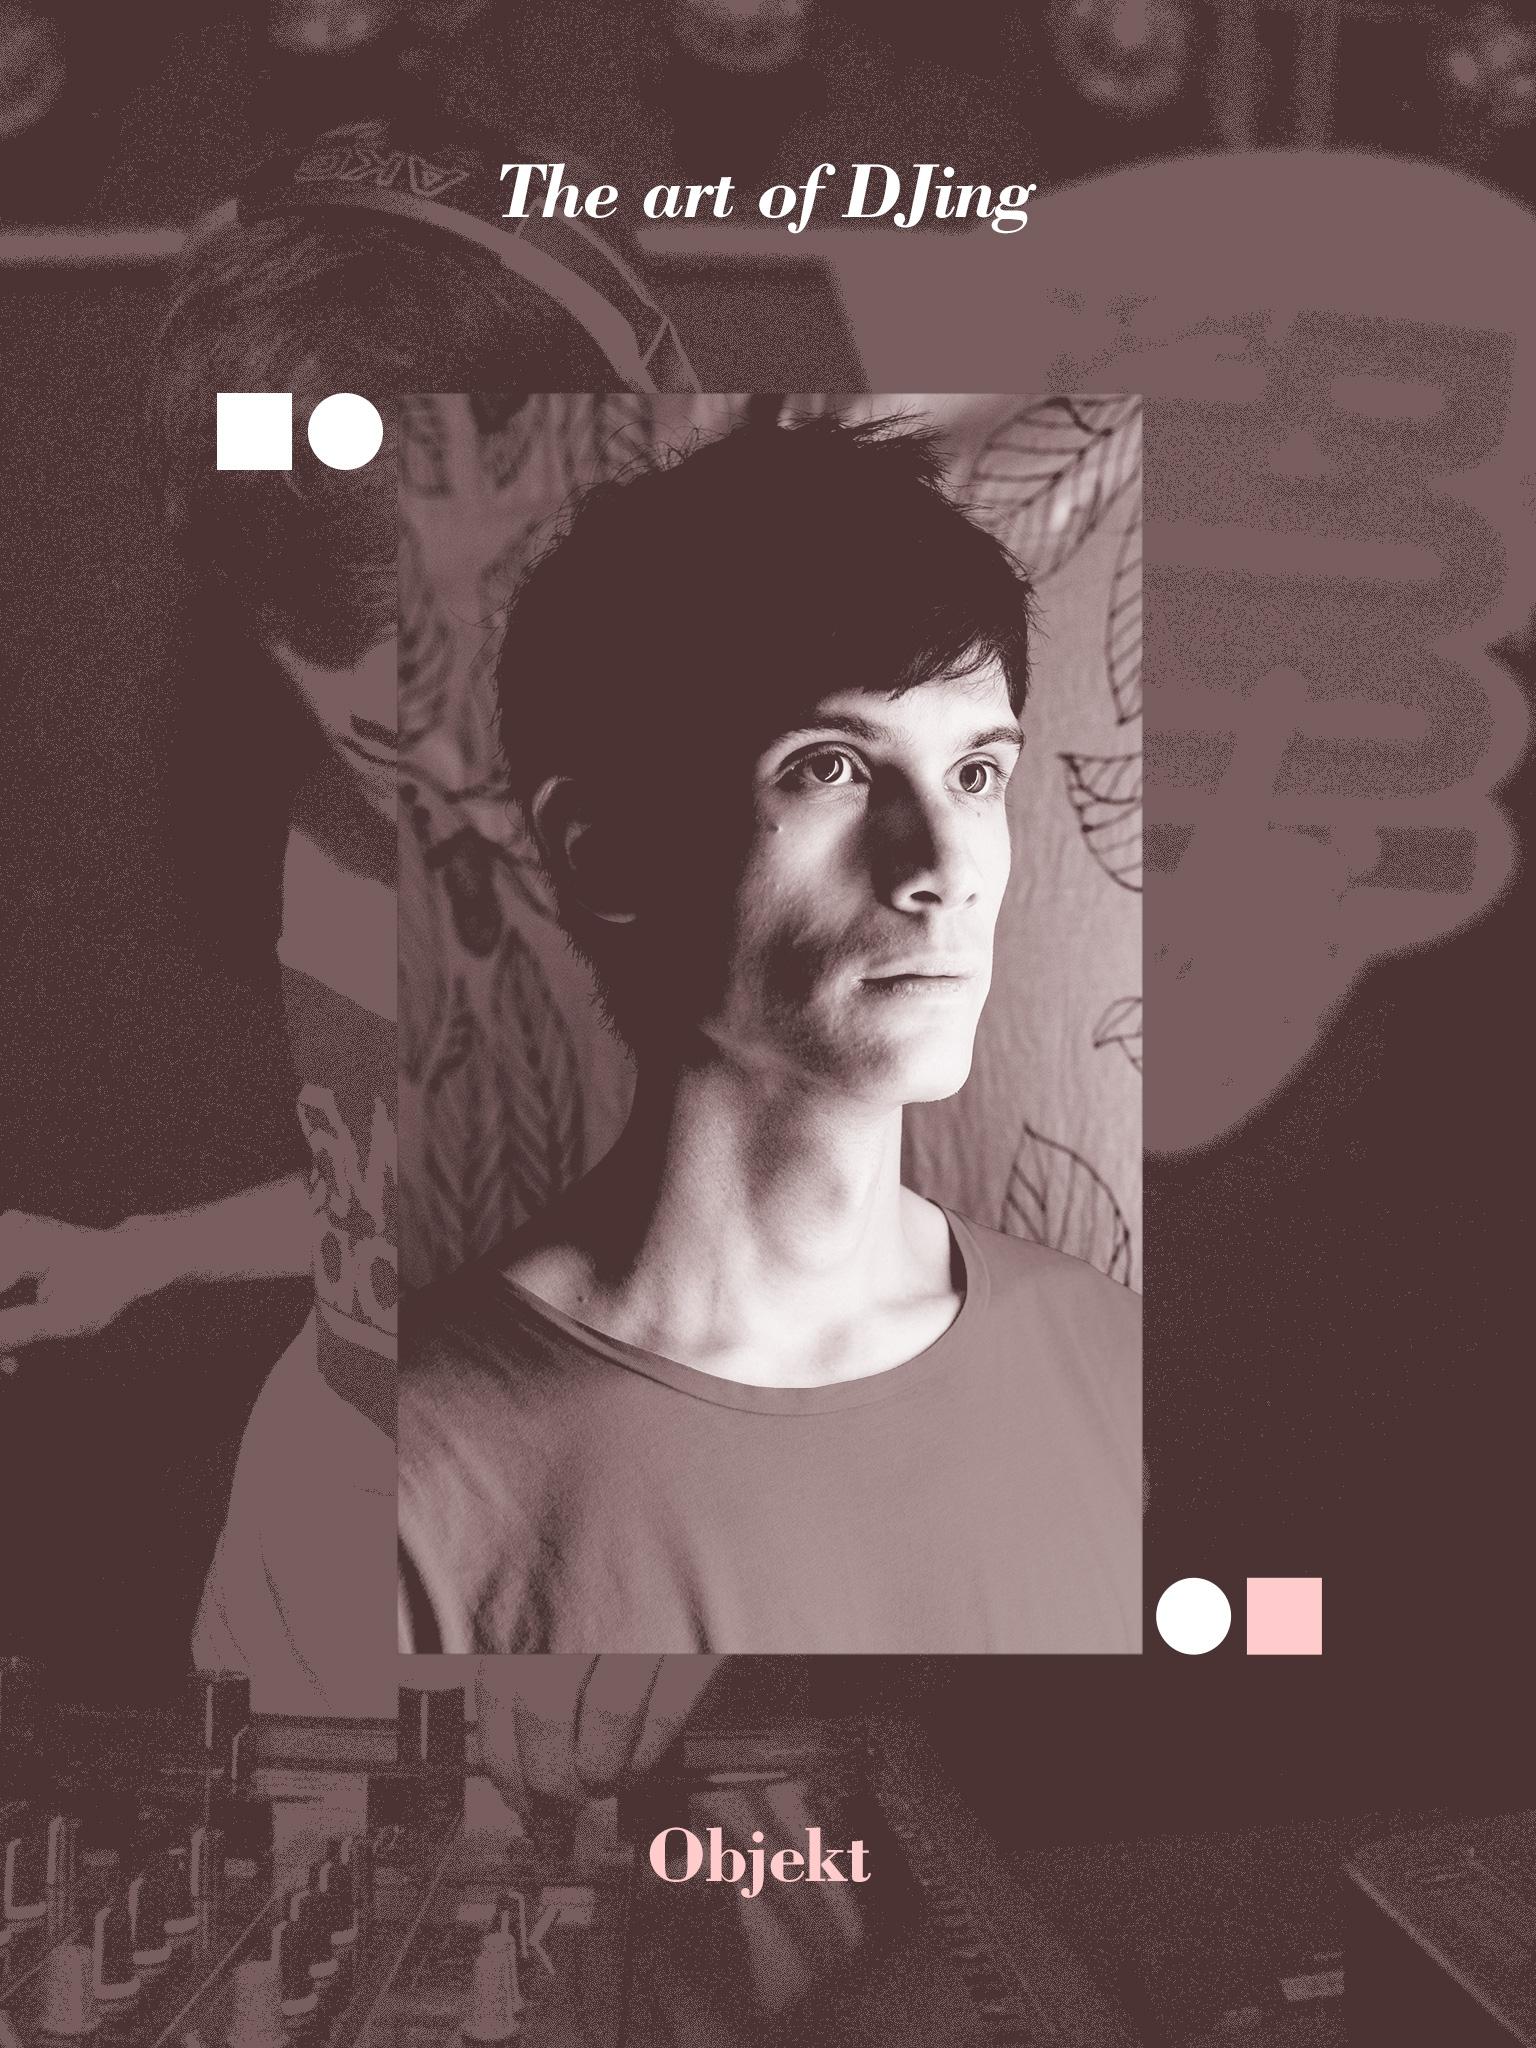 RA: The art of DJing: Objekt